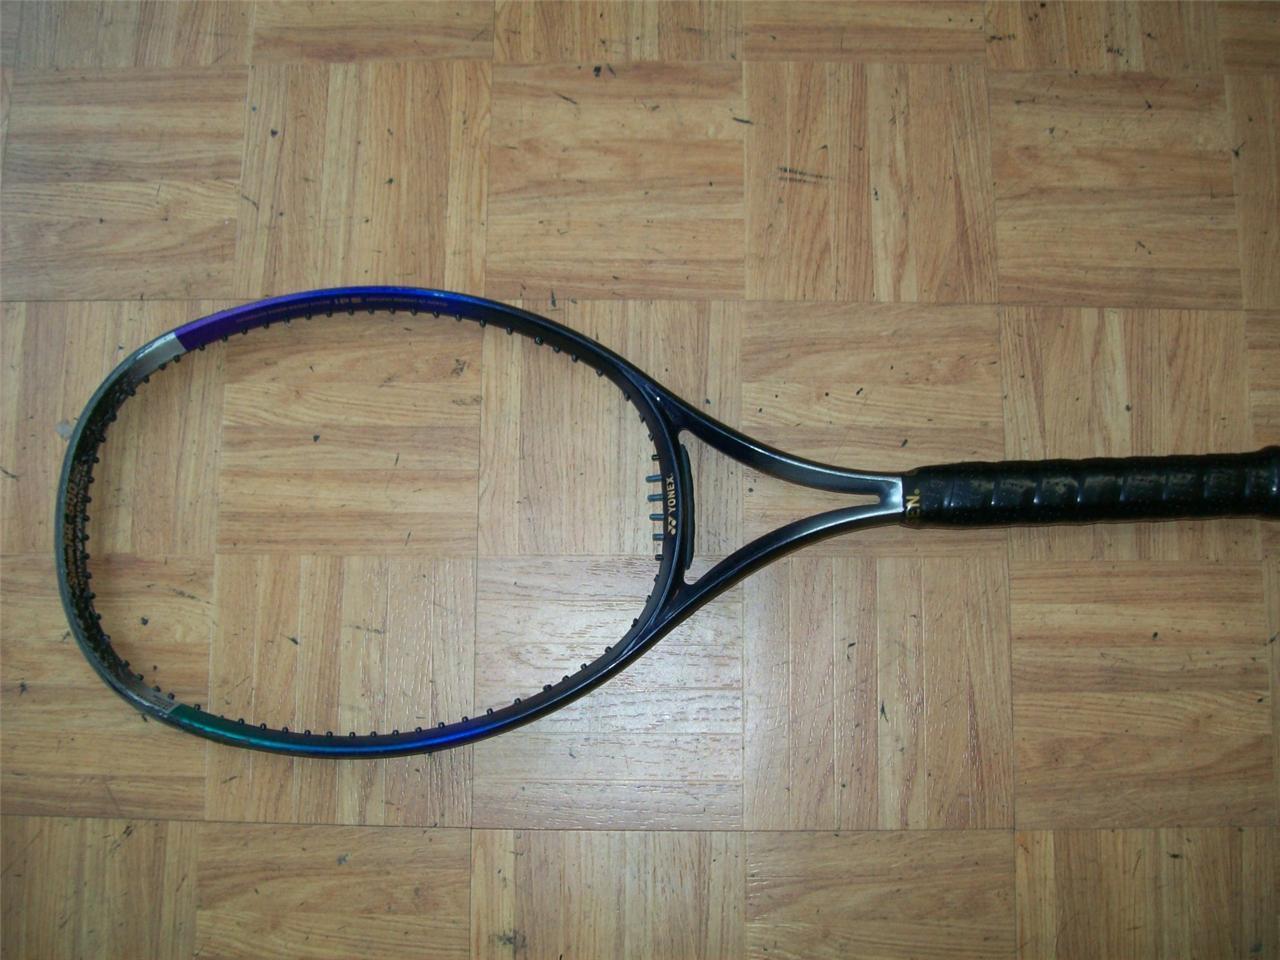 Yonex Super RQ 500 largo Midplus 105 cabeza 4 3 8 Grip Tenis Raqueta